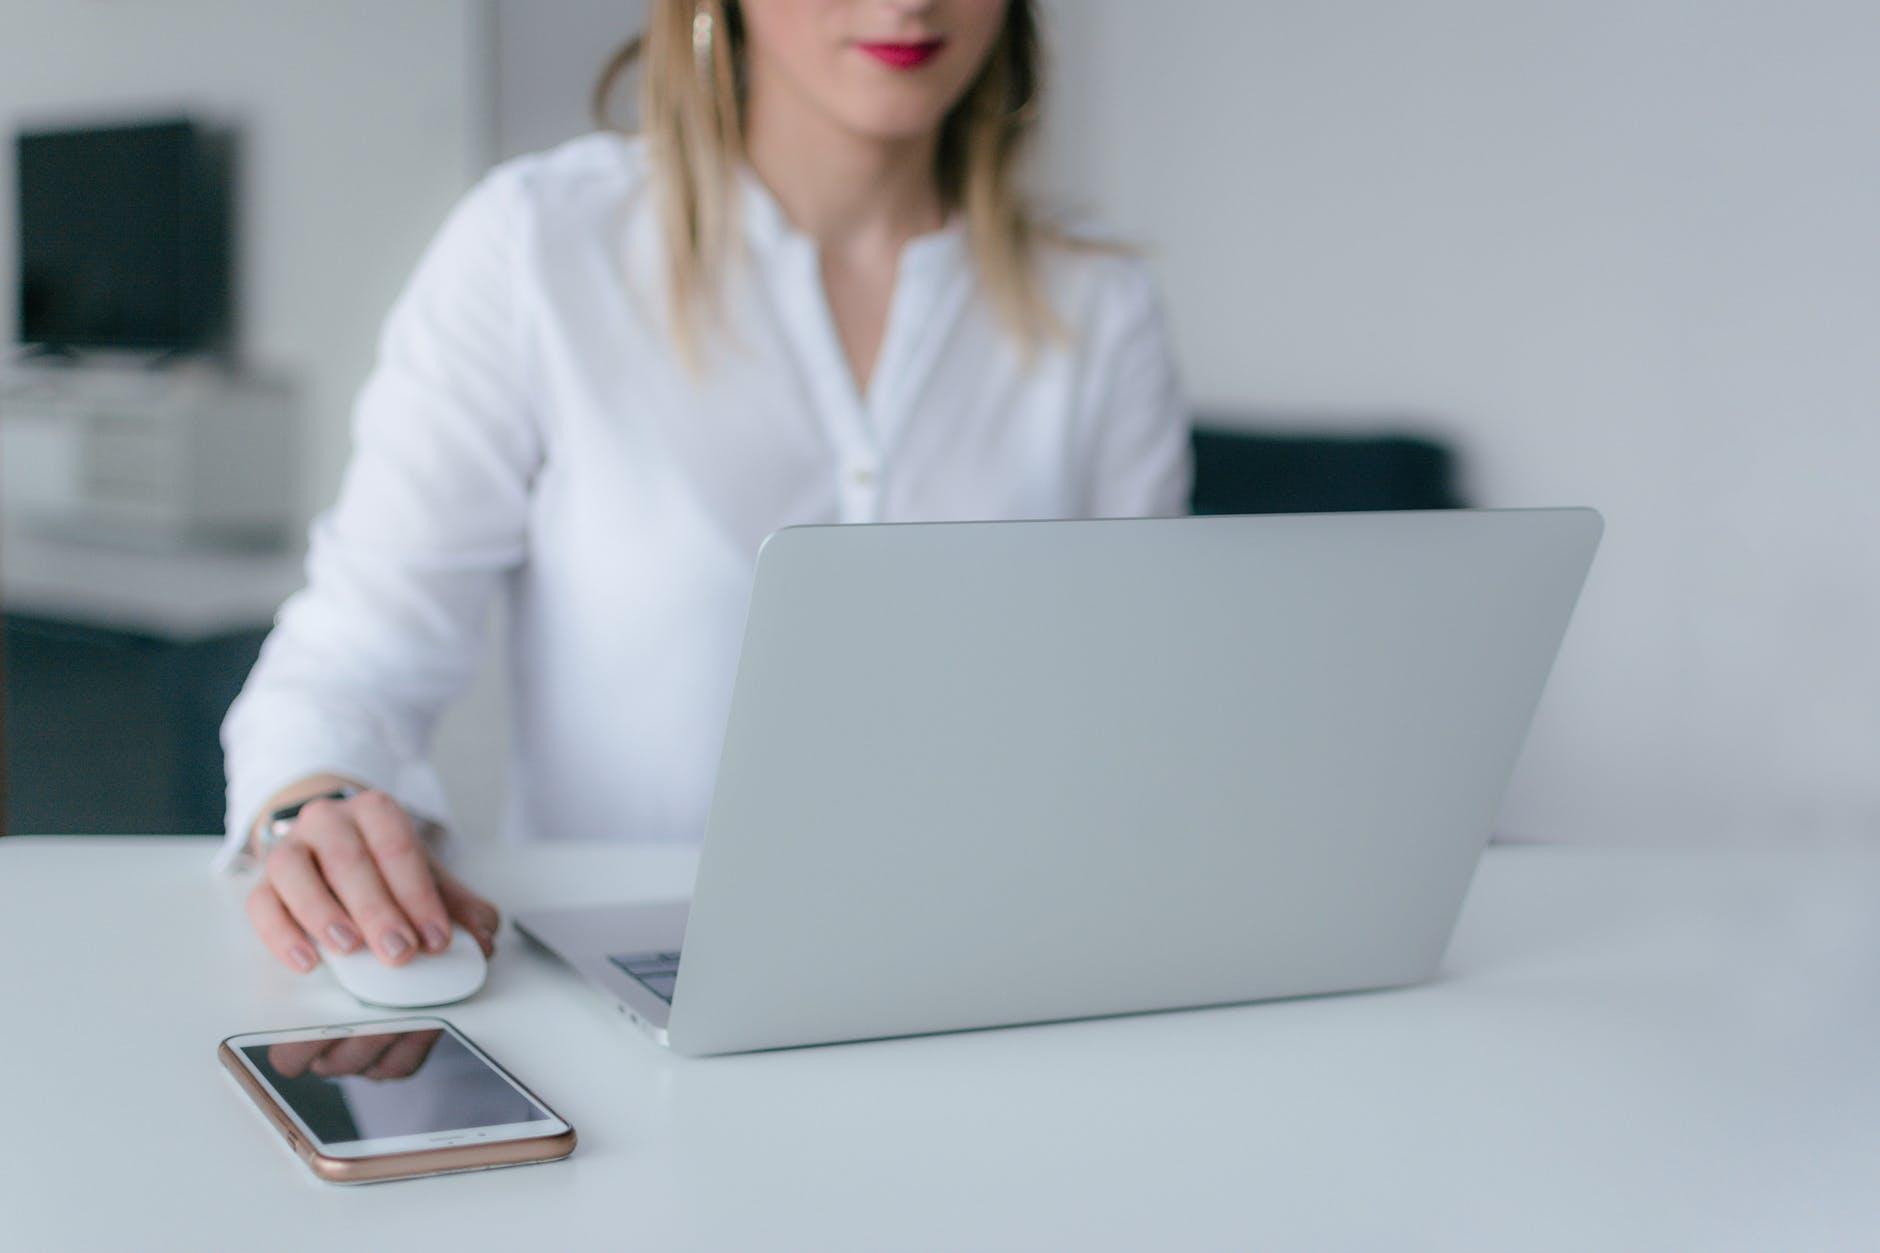 Top Tips for Digital Identity & Data Hacks